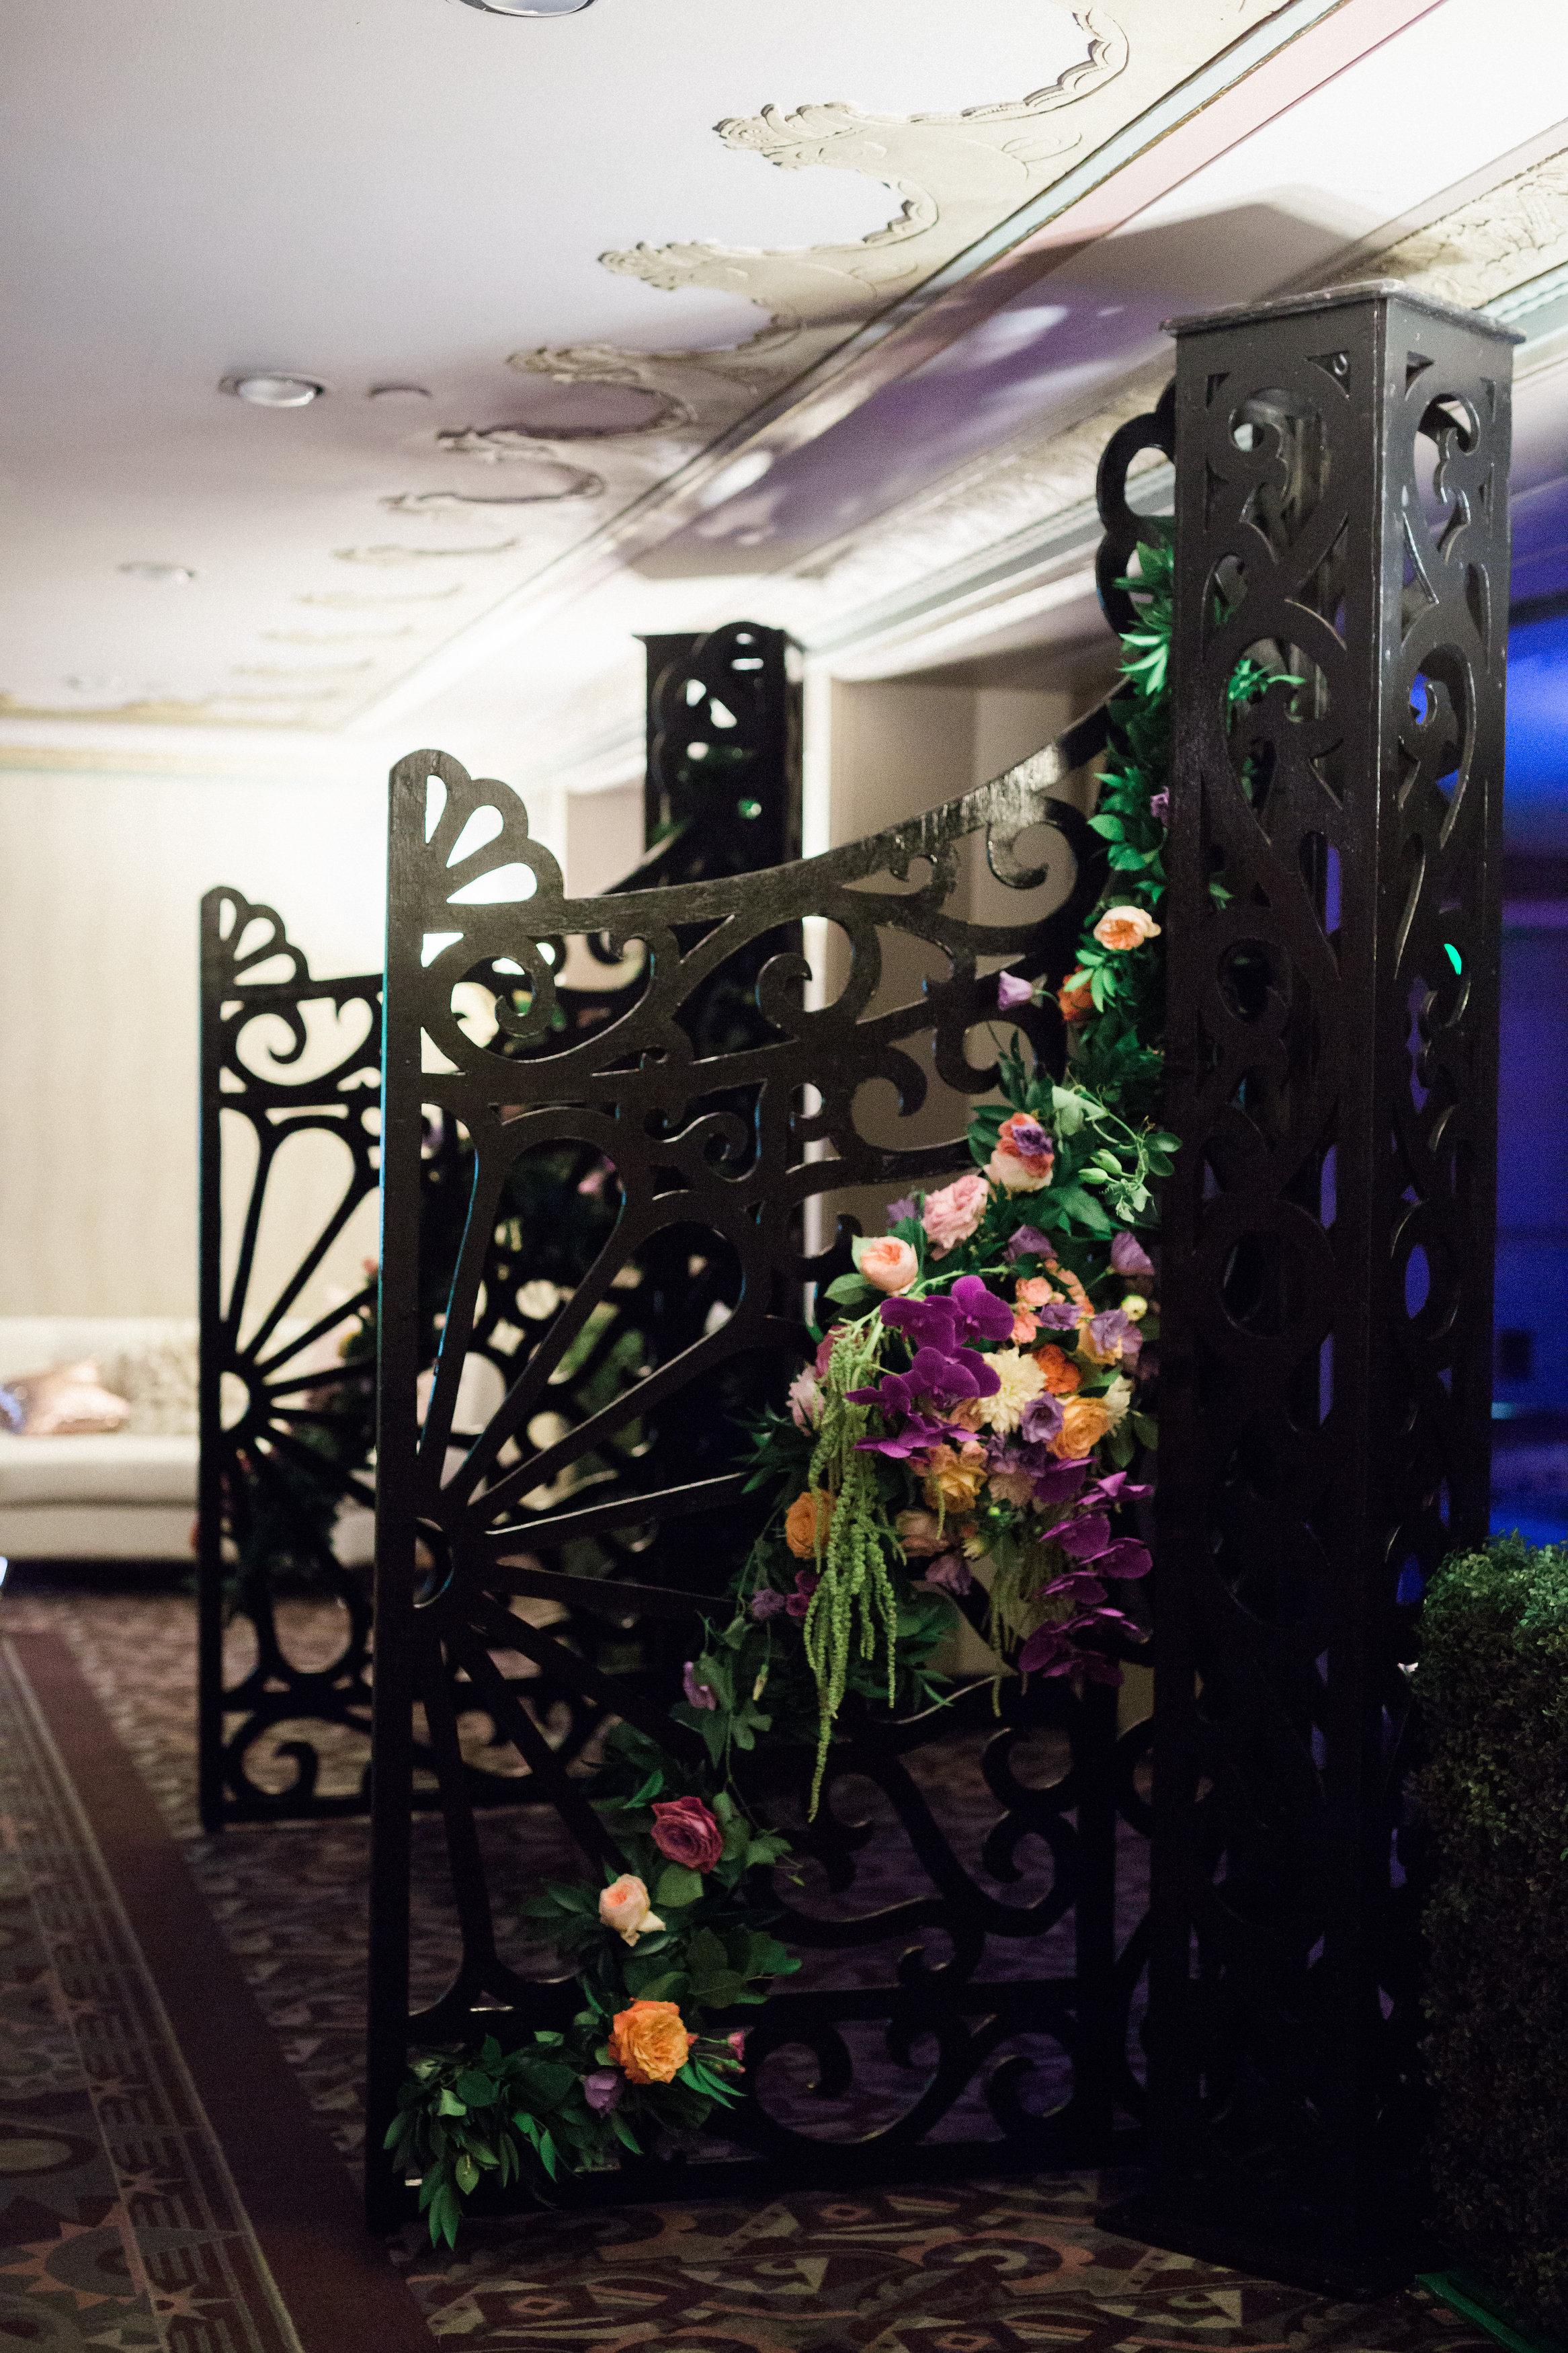 Grand Enterance to Reception at The Hilton Netherland Plaza Hotel Hall of Mirrors Cincinnati, OH